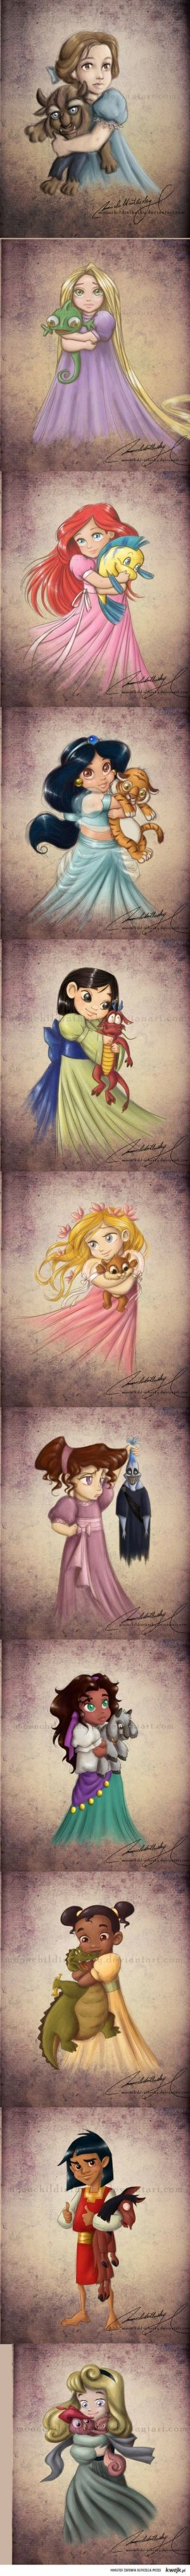 Young Disney princesses.